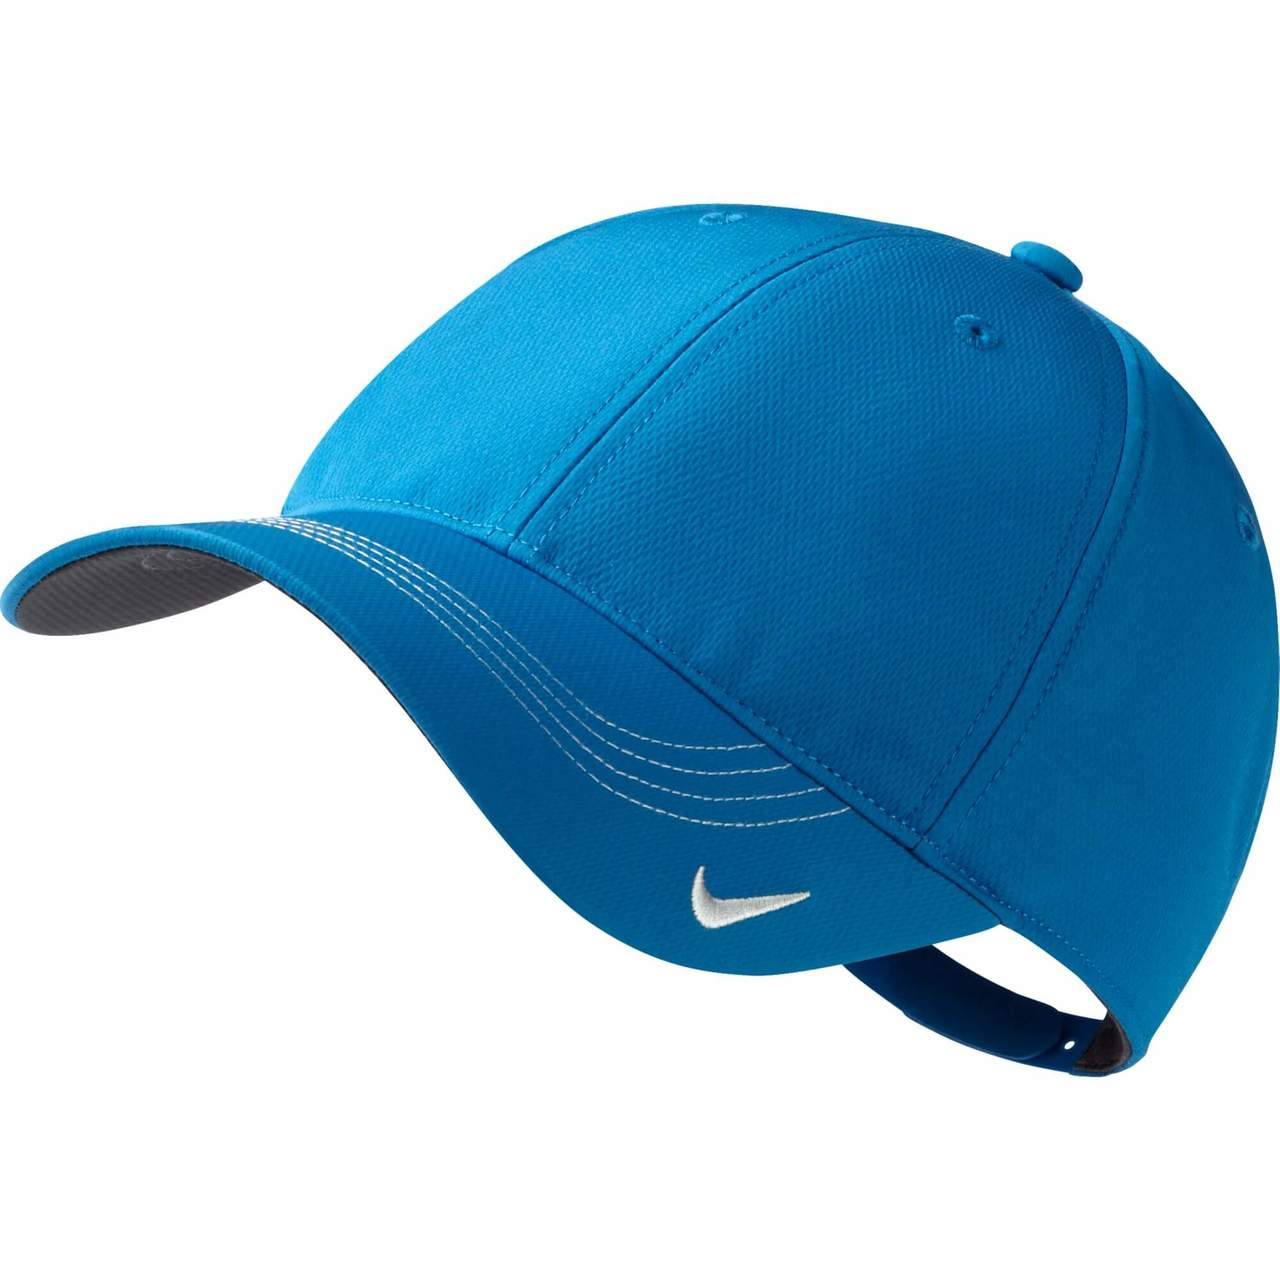 d8c05d78b00 Nike Contrast Stitch Blank Golf Hat - Golfland Warehouse